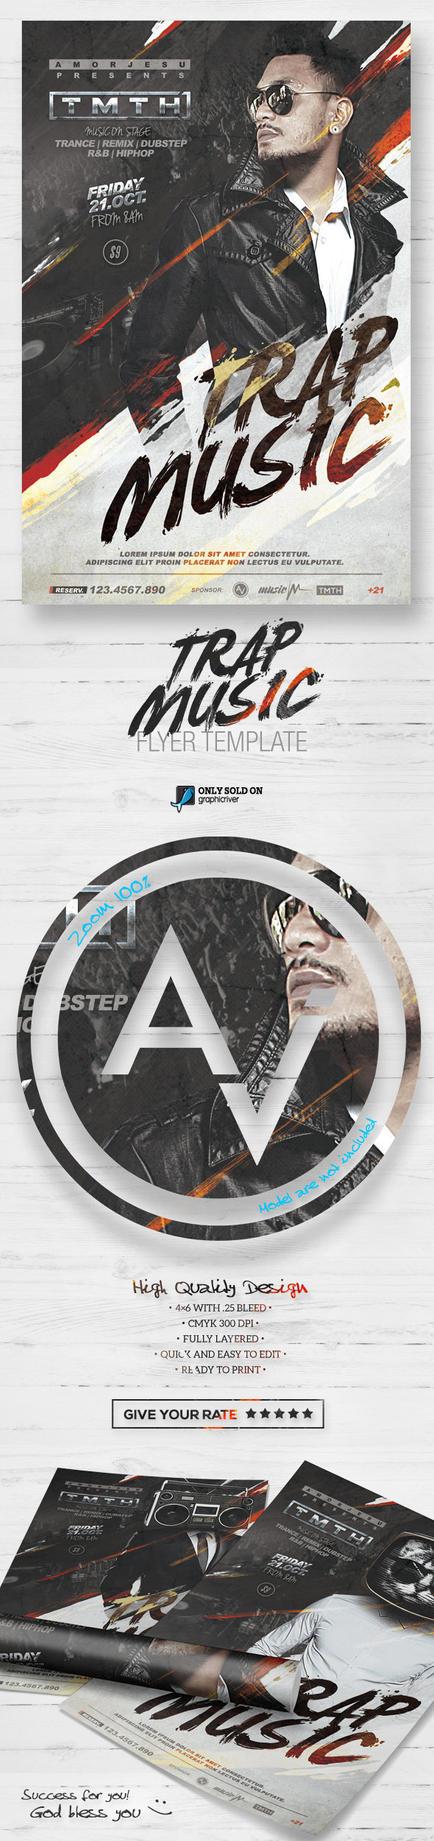 DJ Guest Flyer Template V2 by amorjesu